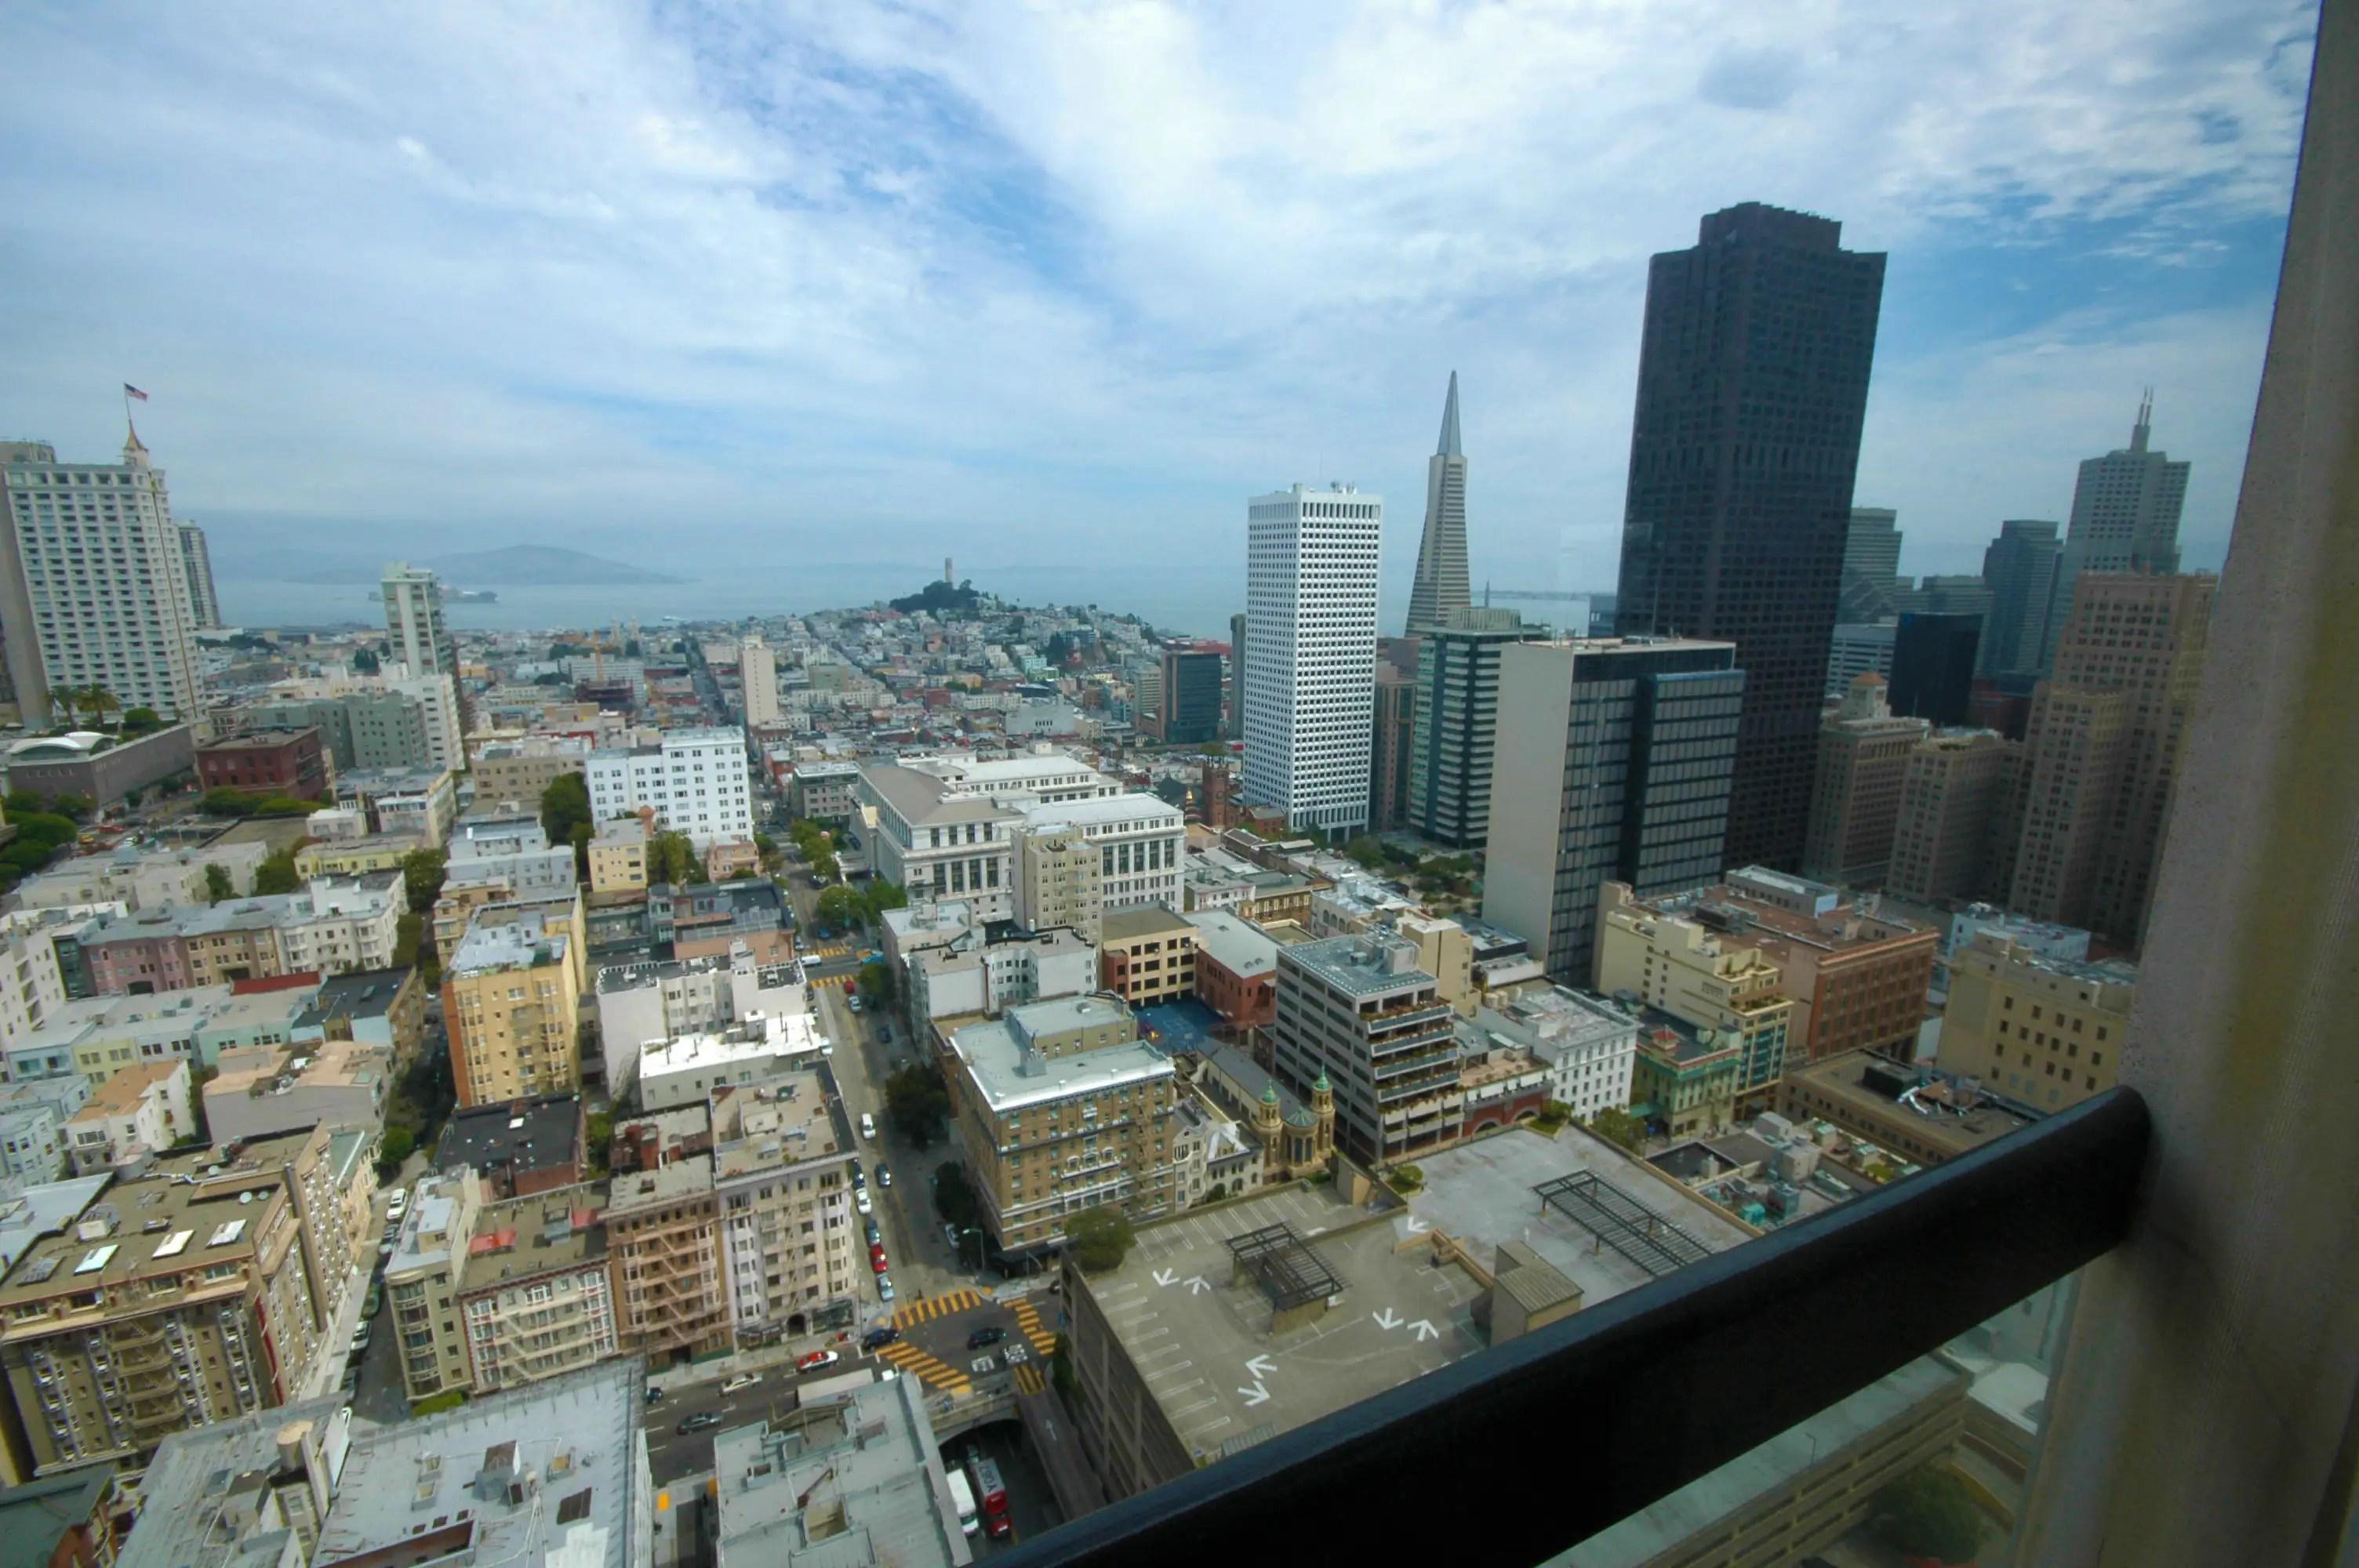 2. San Francisco: 48.58 hours